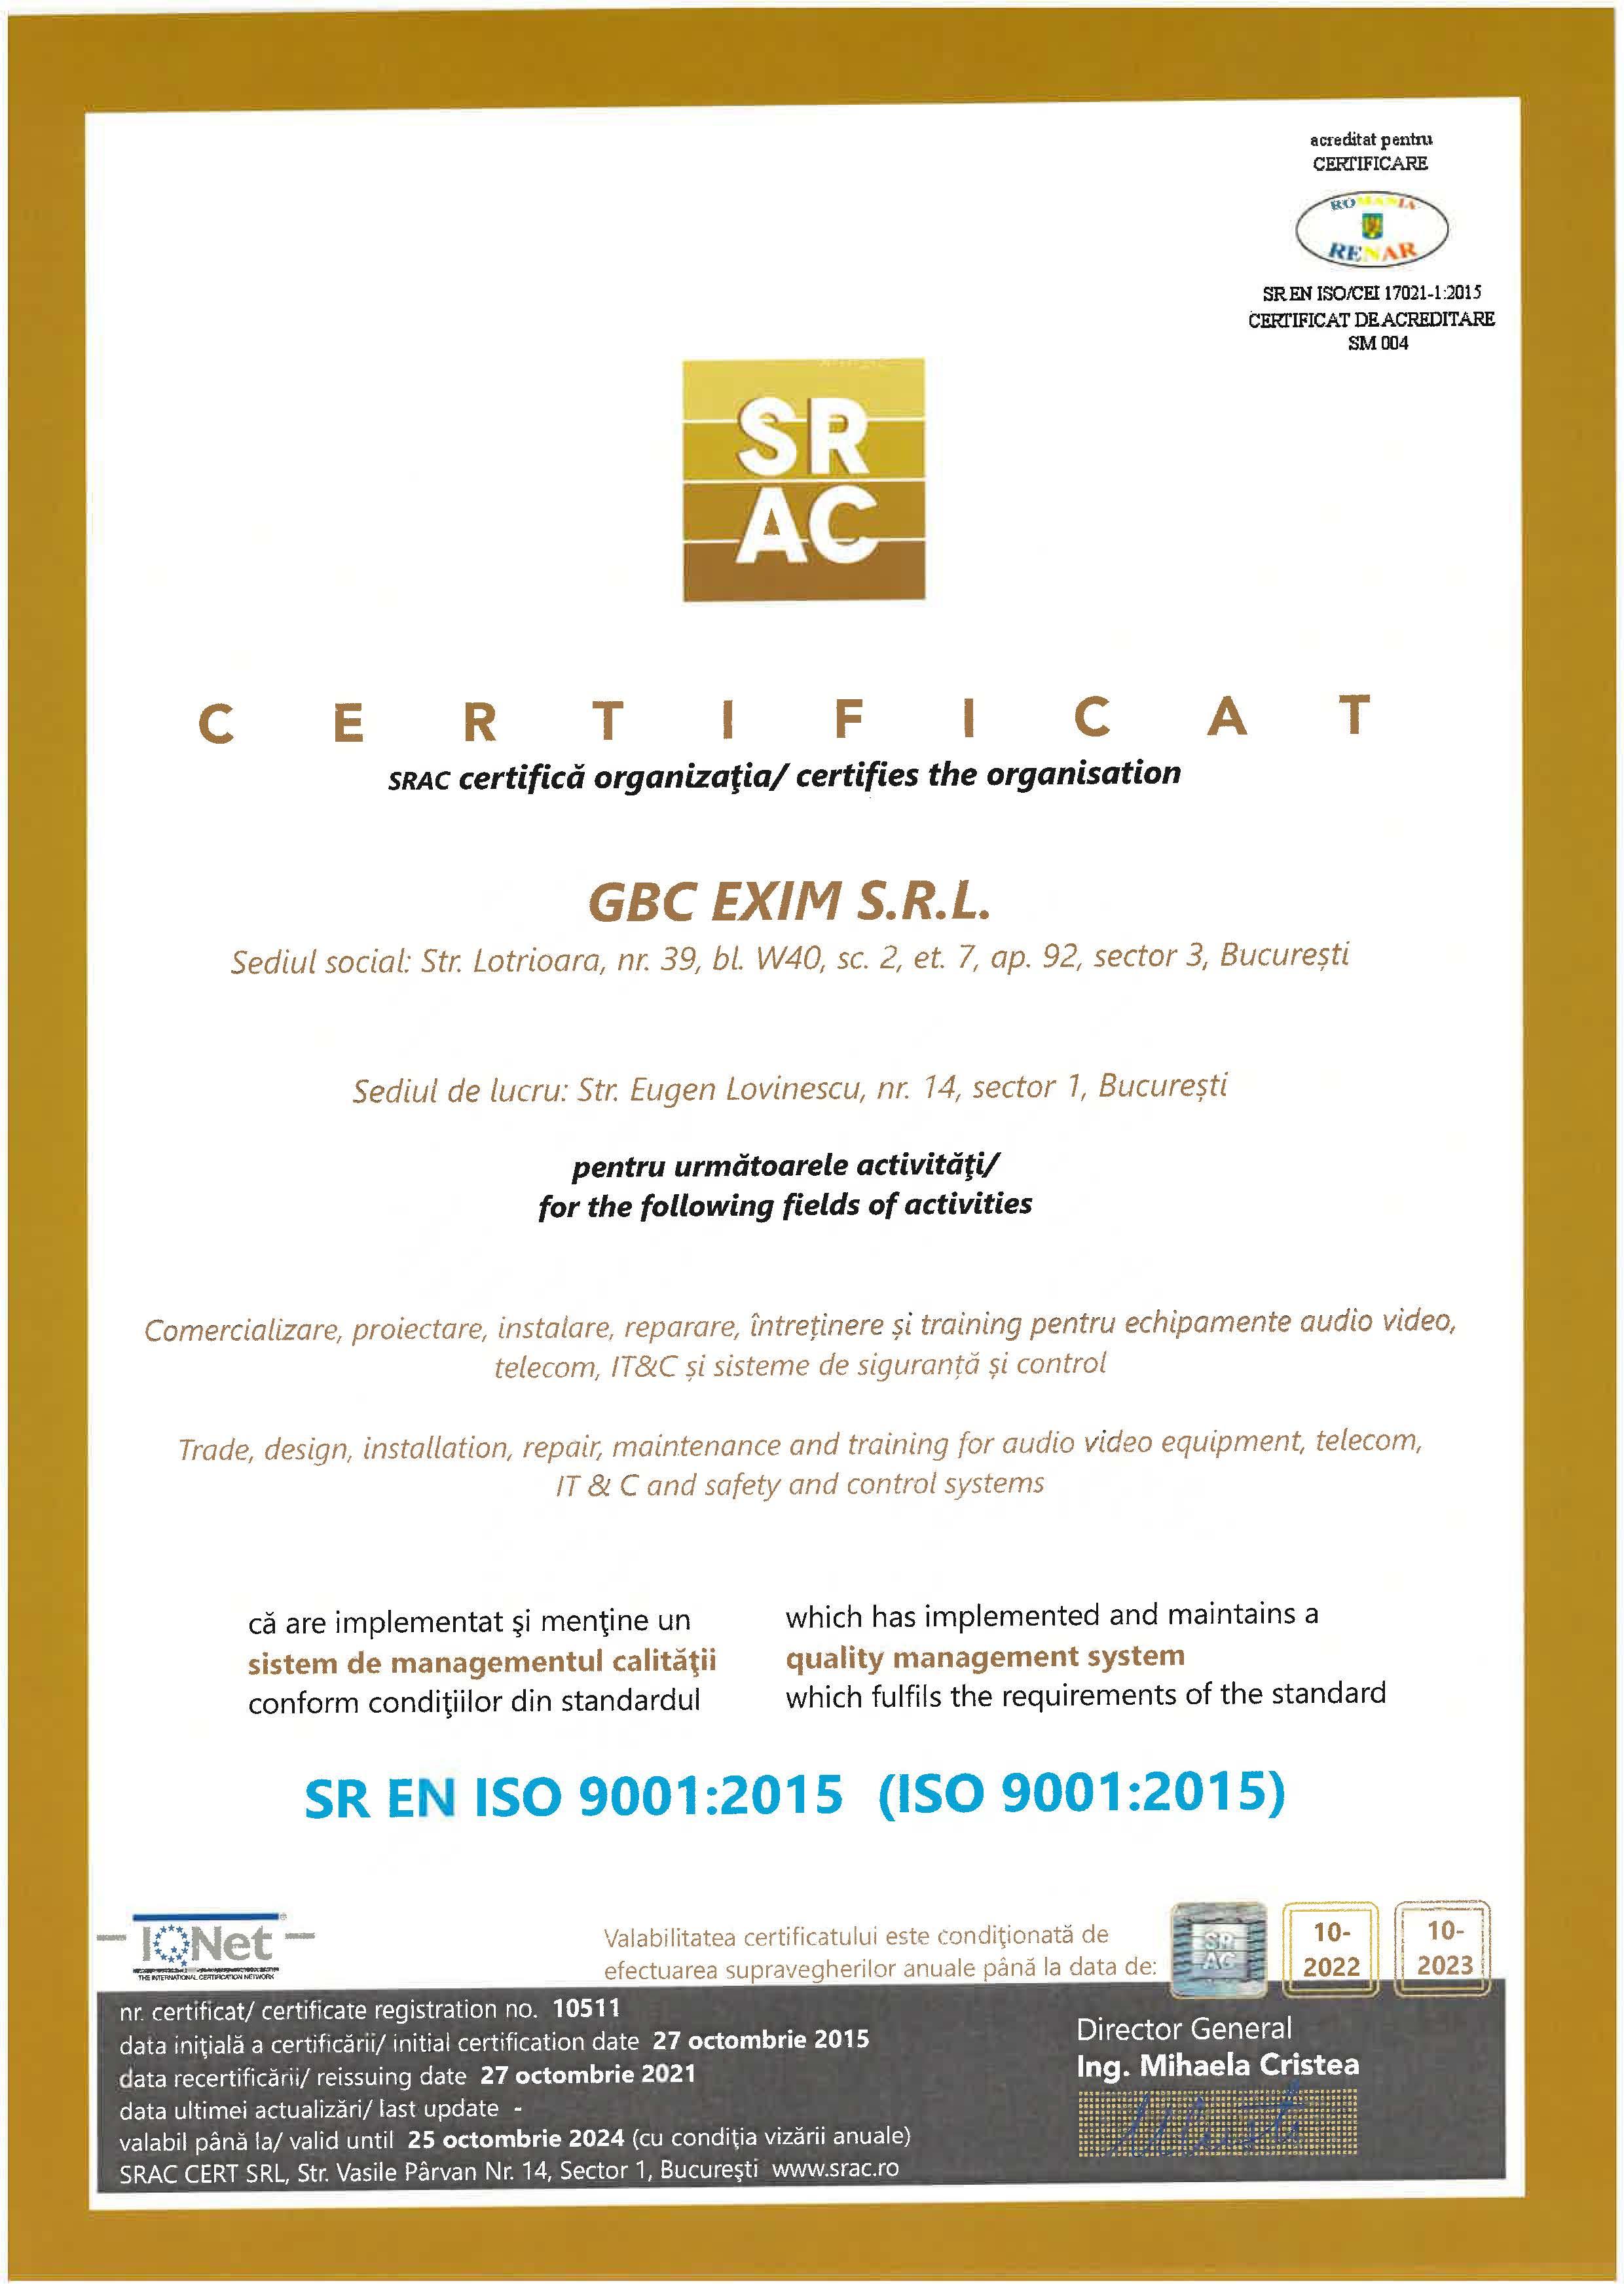 Certificare SR EN ISO 9001:2015